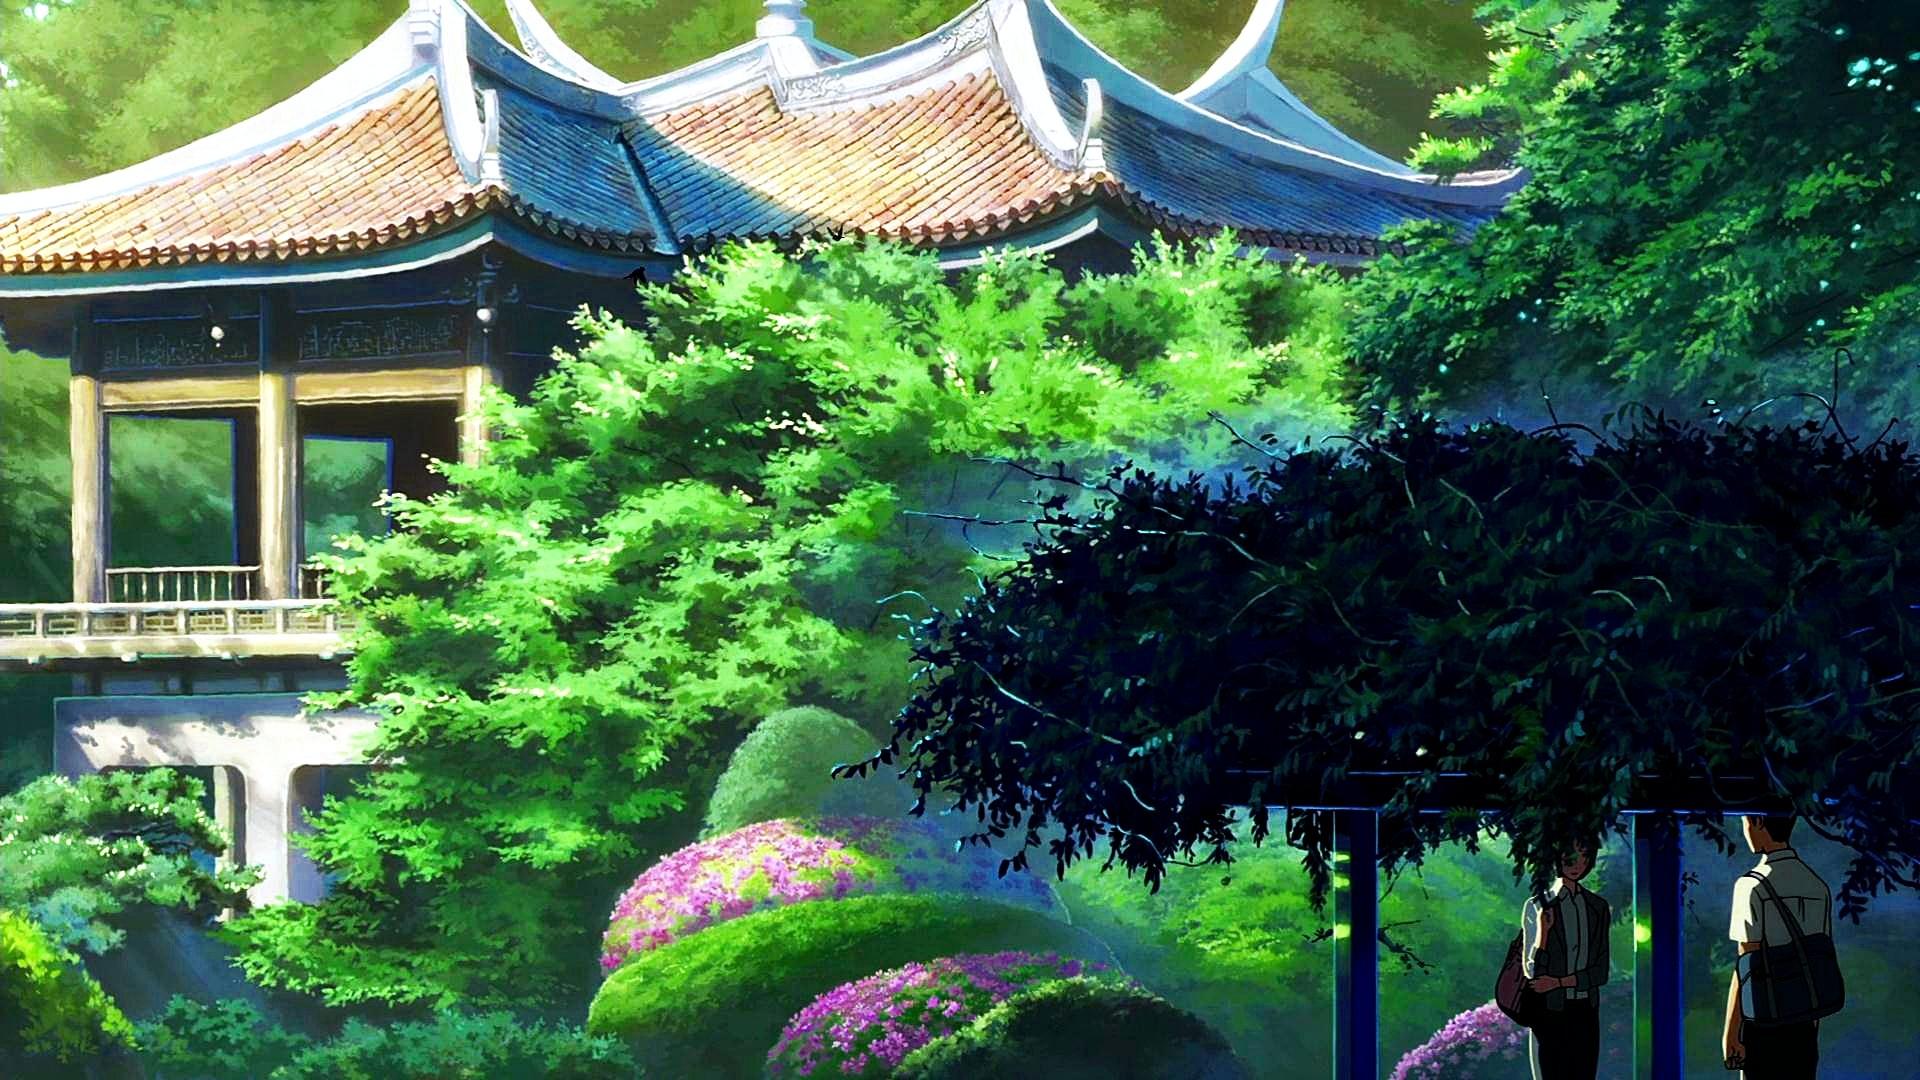 Free Download Kotonoha No Niwa Landspaces The Garden Of Words